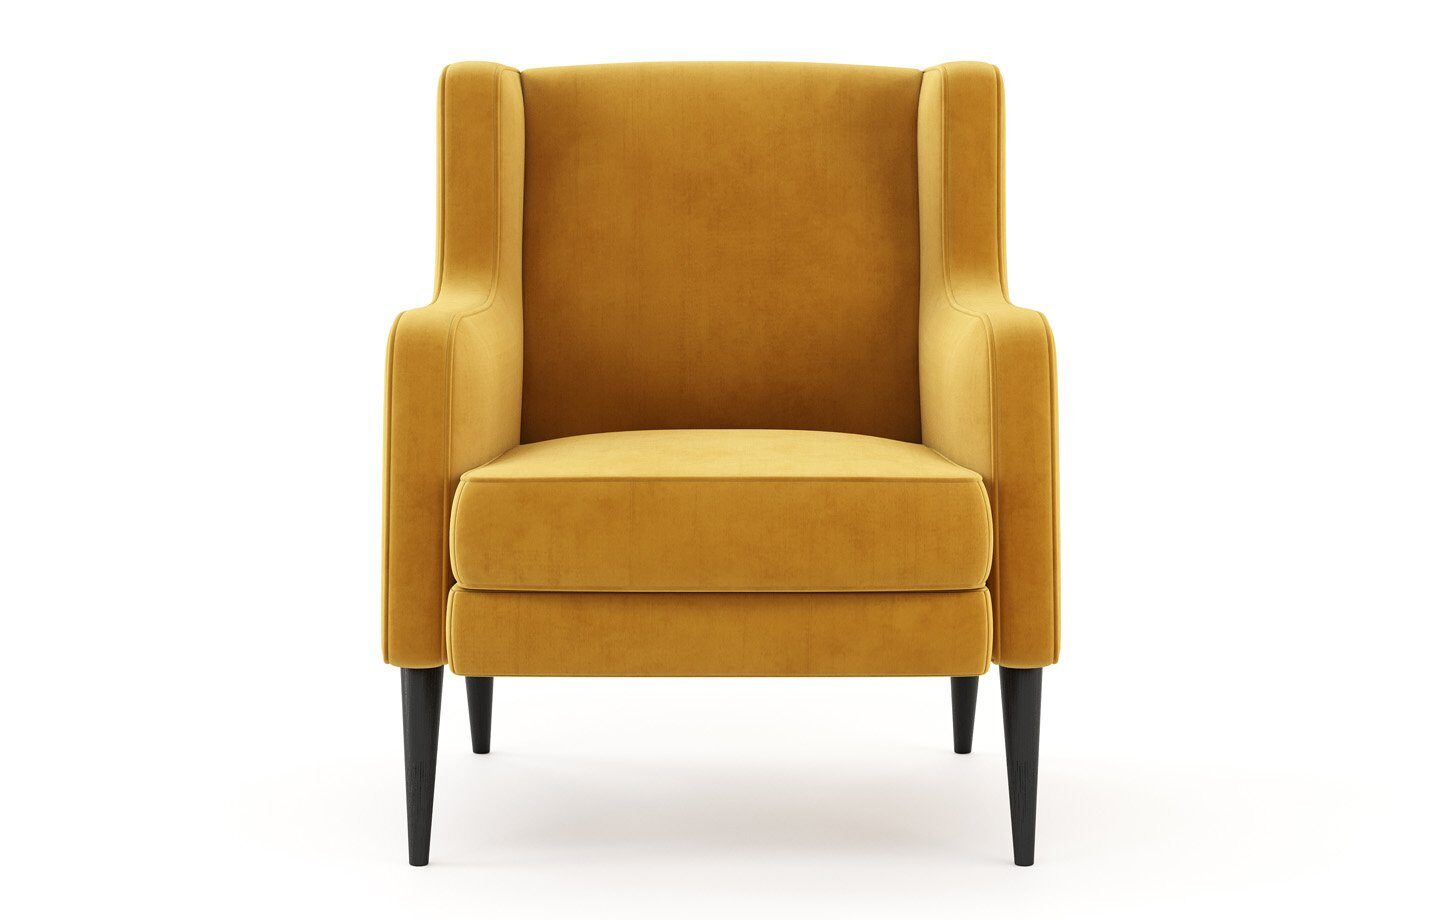 Mariposa-Lounge-Chair-by-fabiia-furniture-signature-2